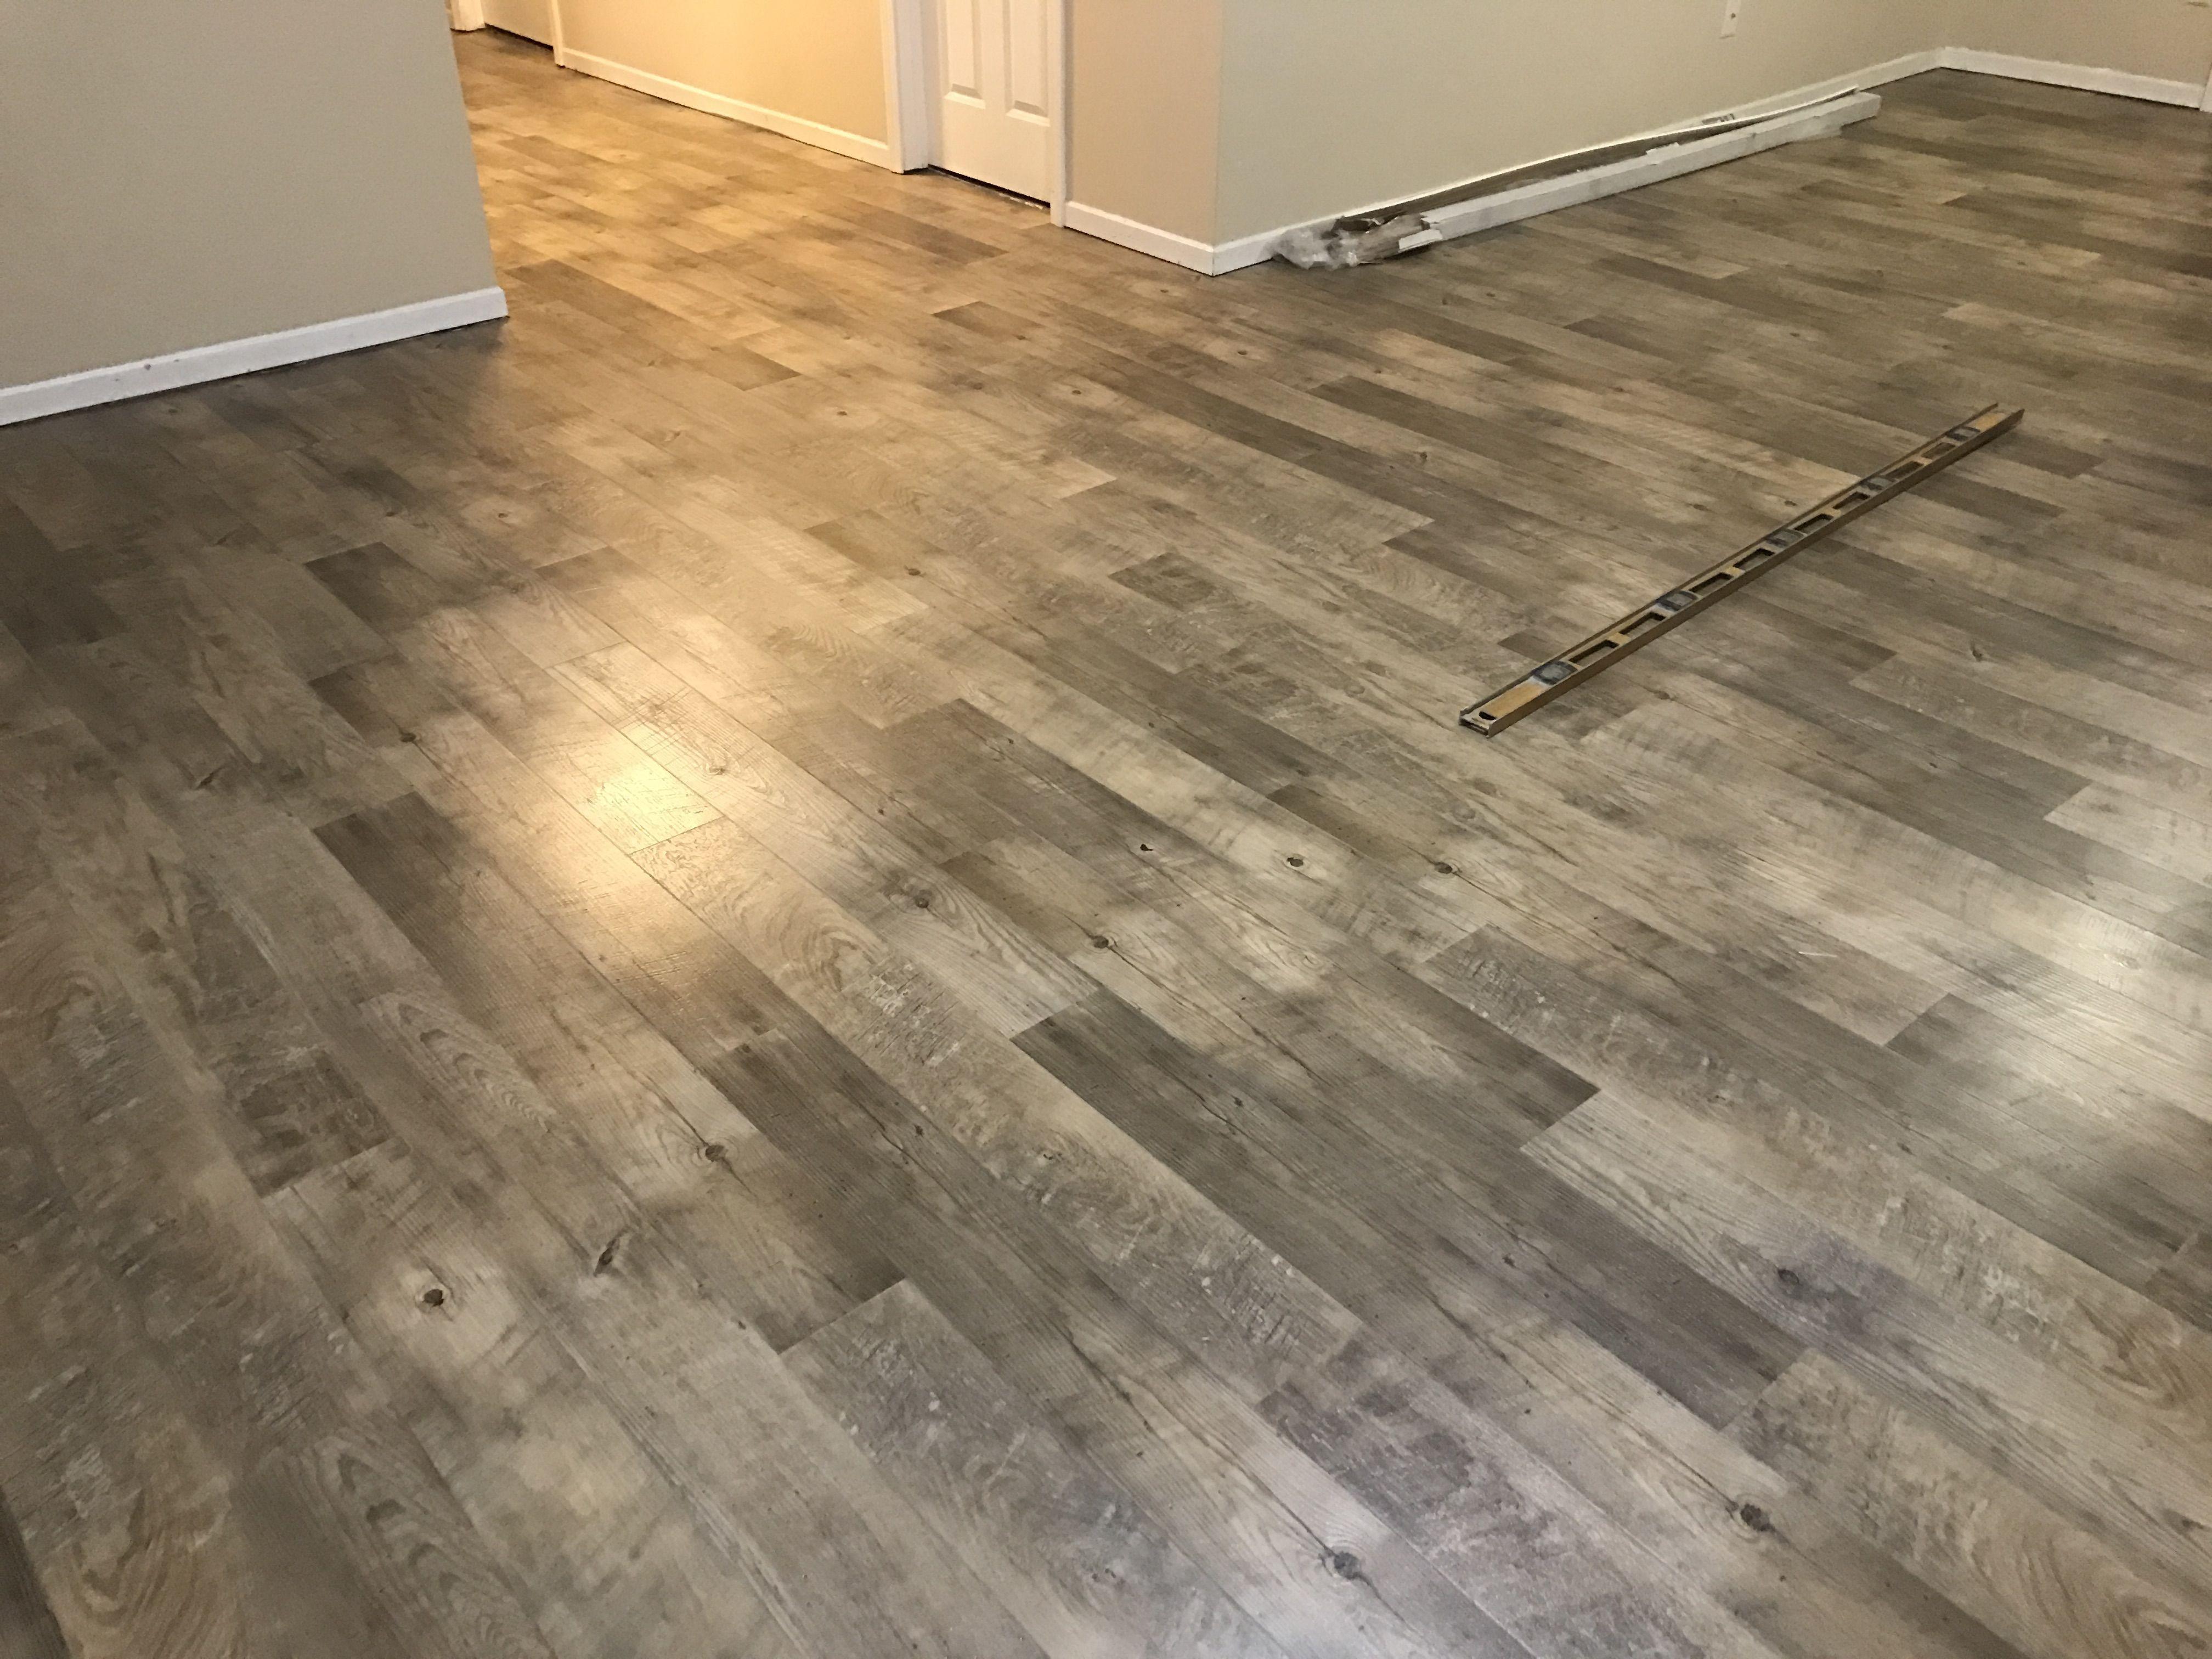 hardwood tile flooring of vinyl plan flooring unique tile that looks like hardwood floors regarding related post